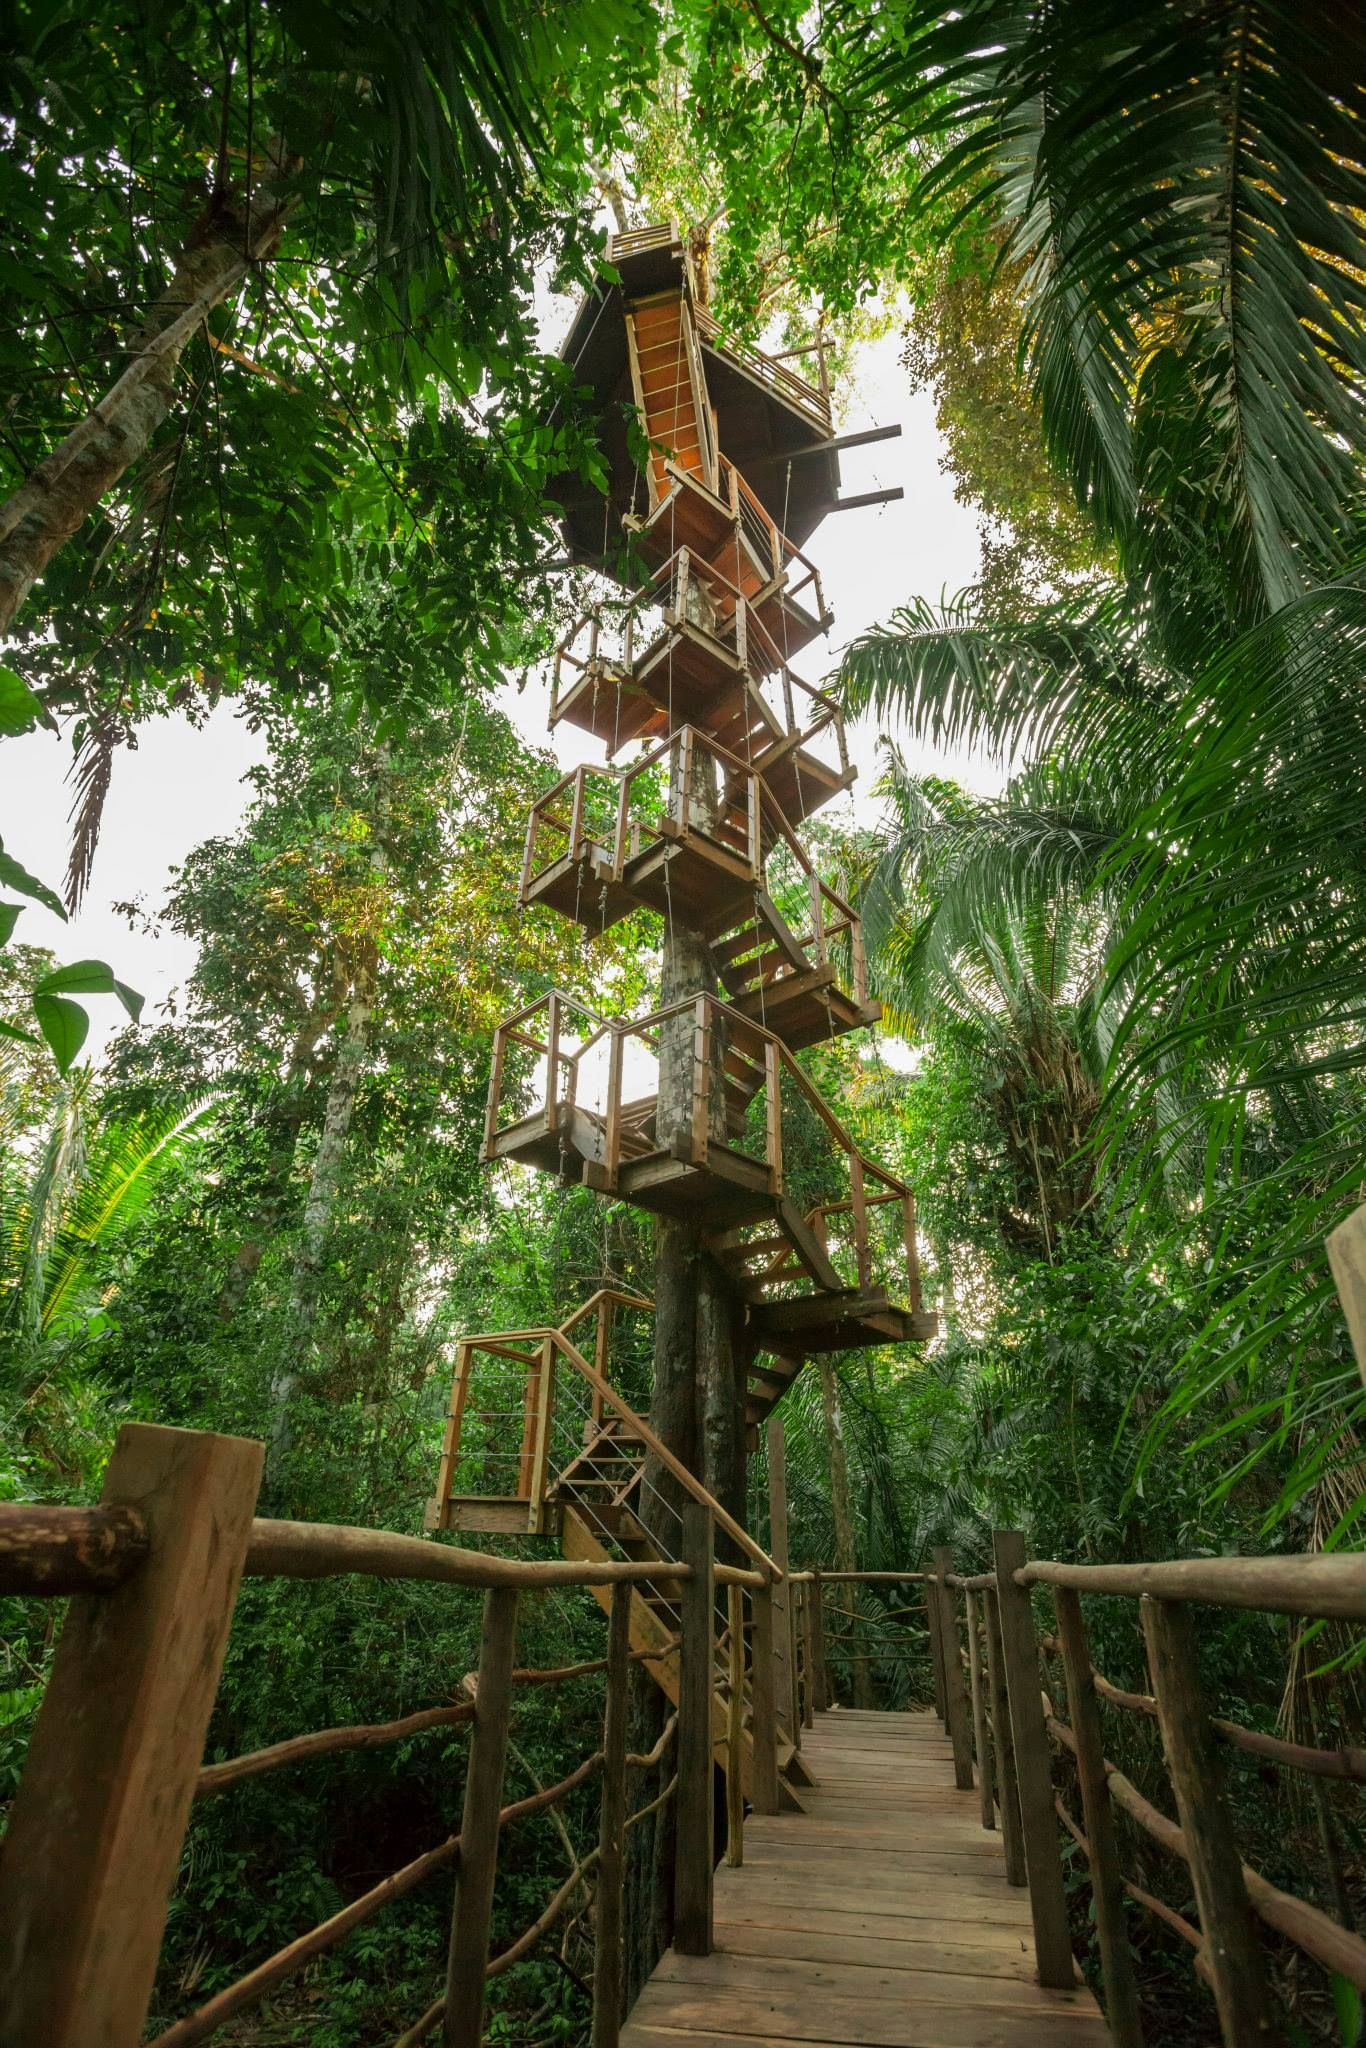 8 Romantic Reasons Why The Amazon Is The Best Honeymoon